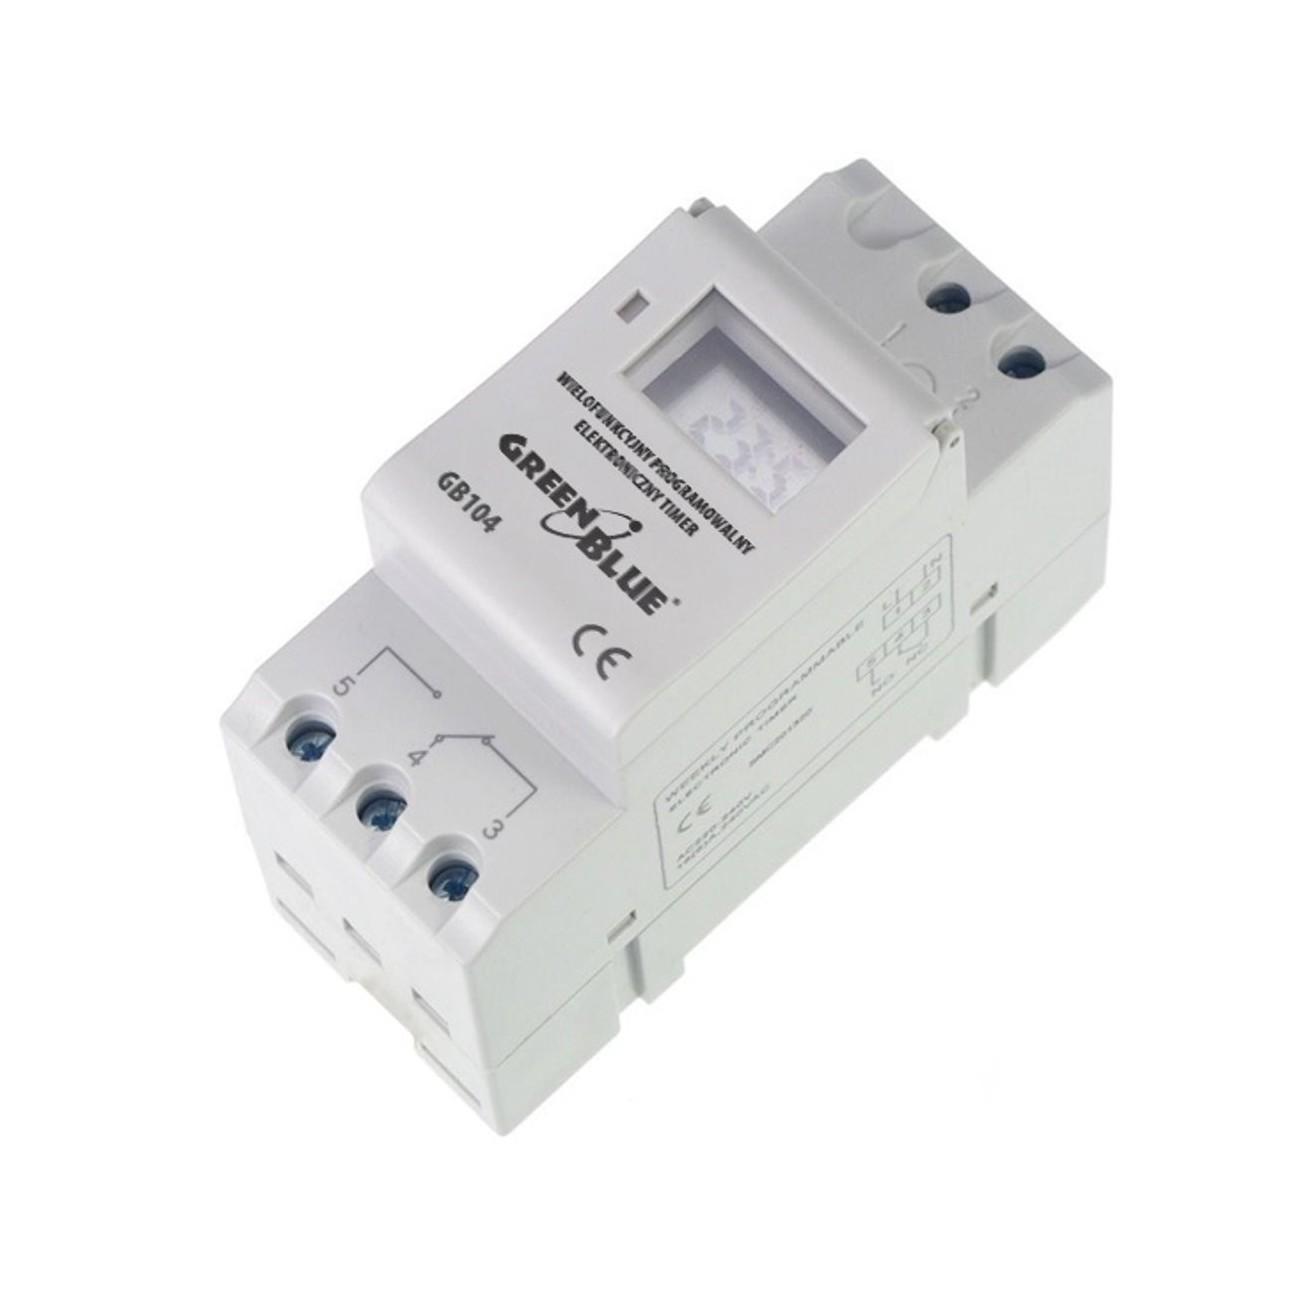 GreenBlue - GB104 Temporizador digital, planificador semanal